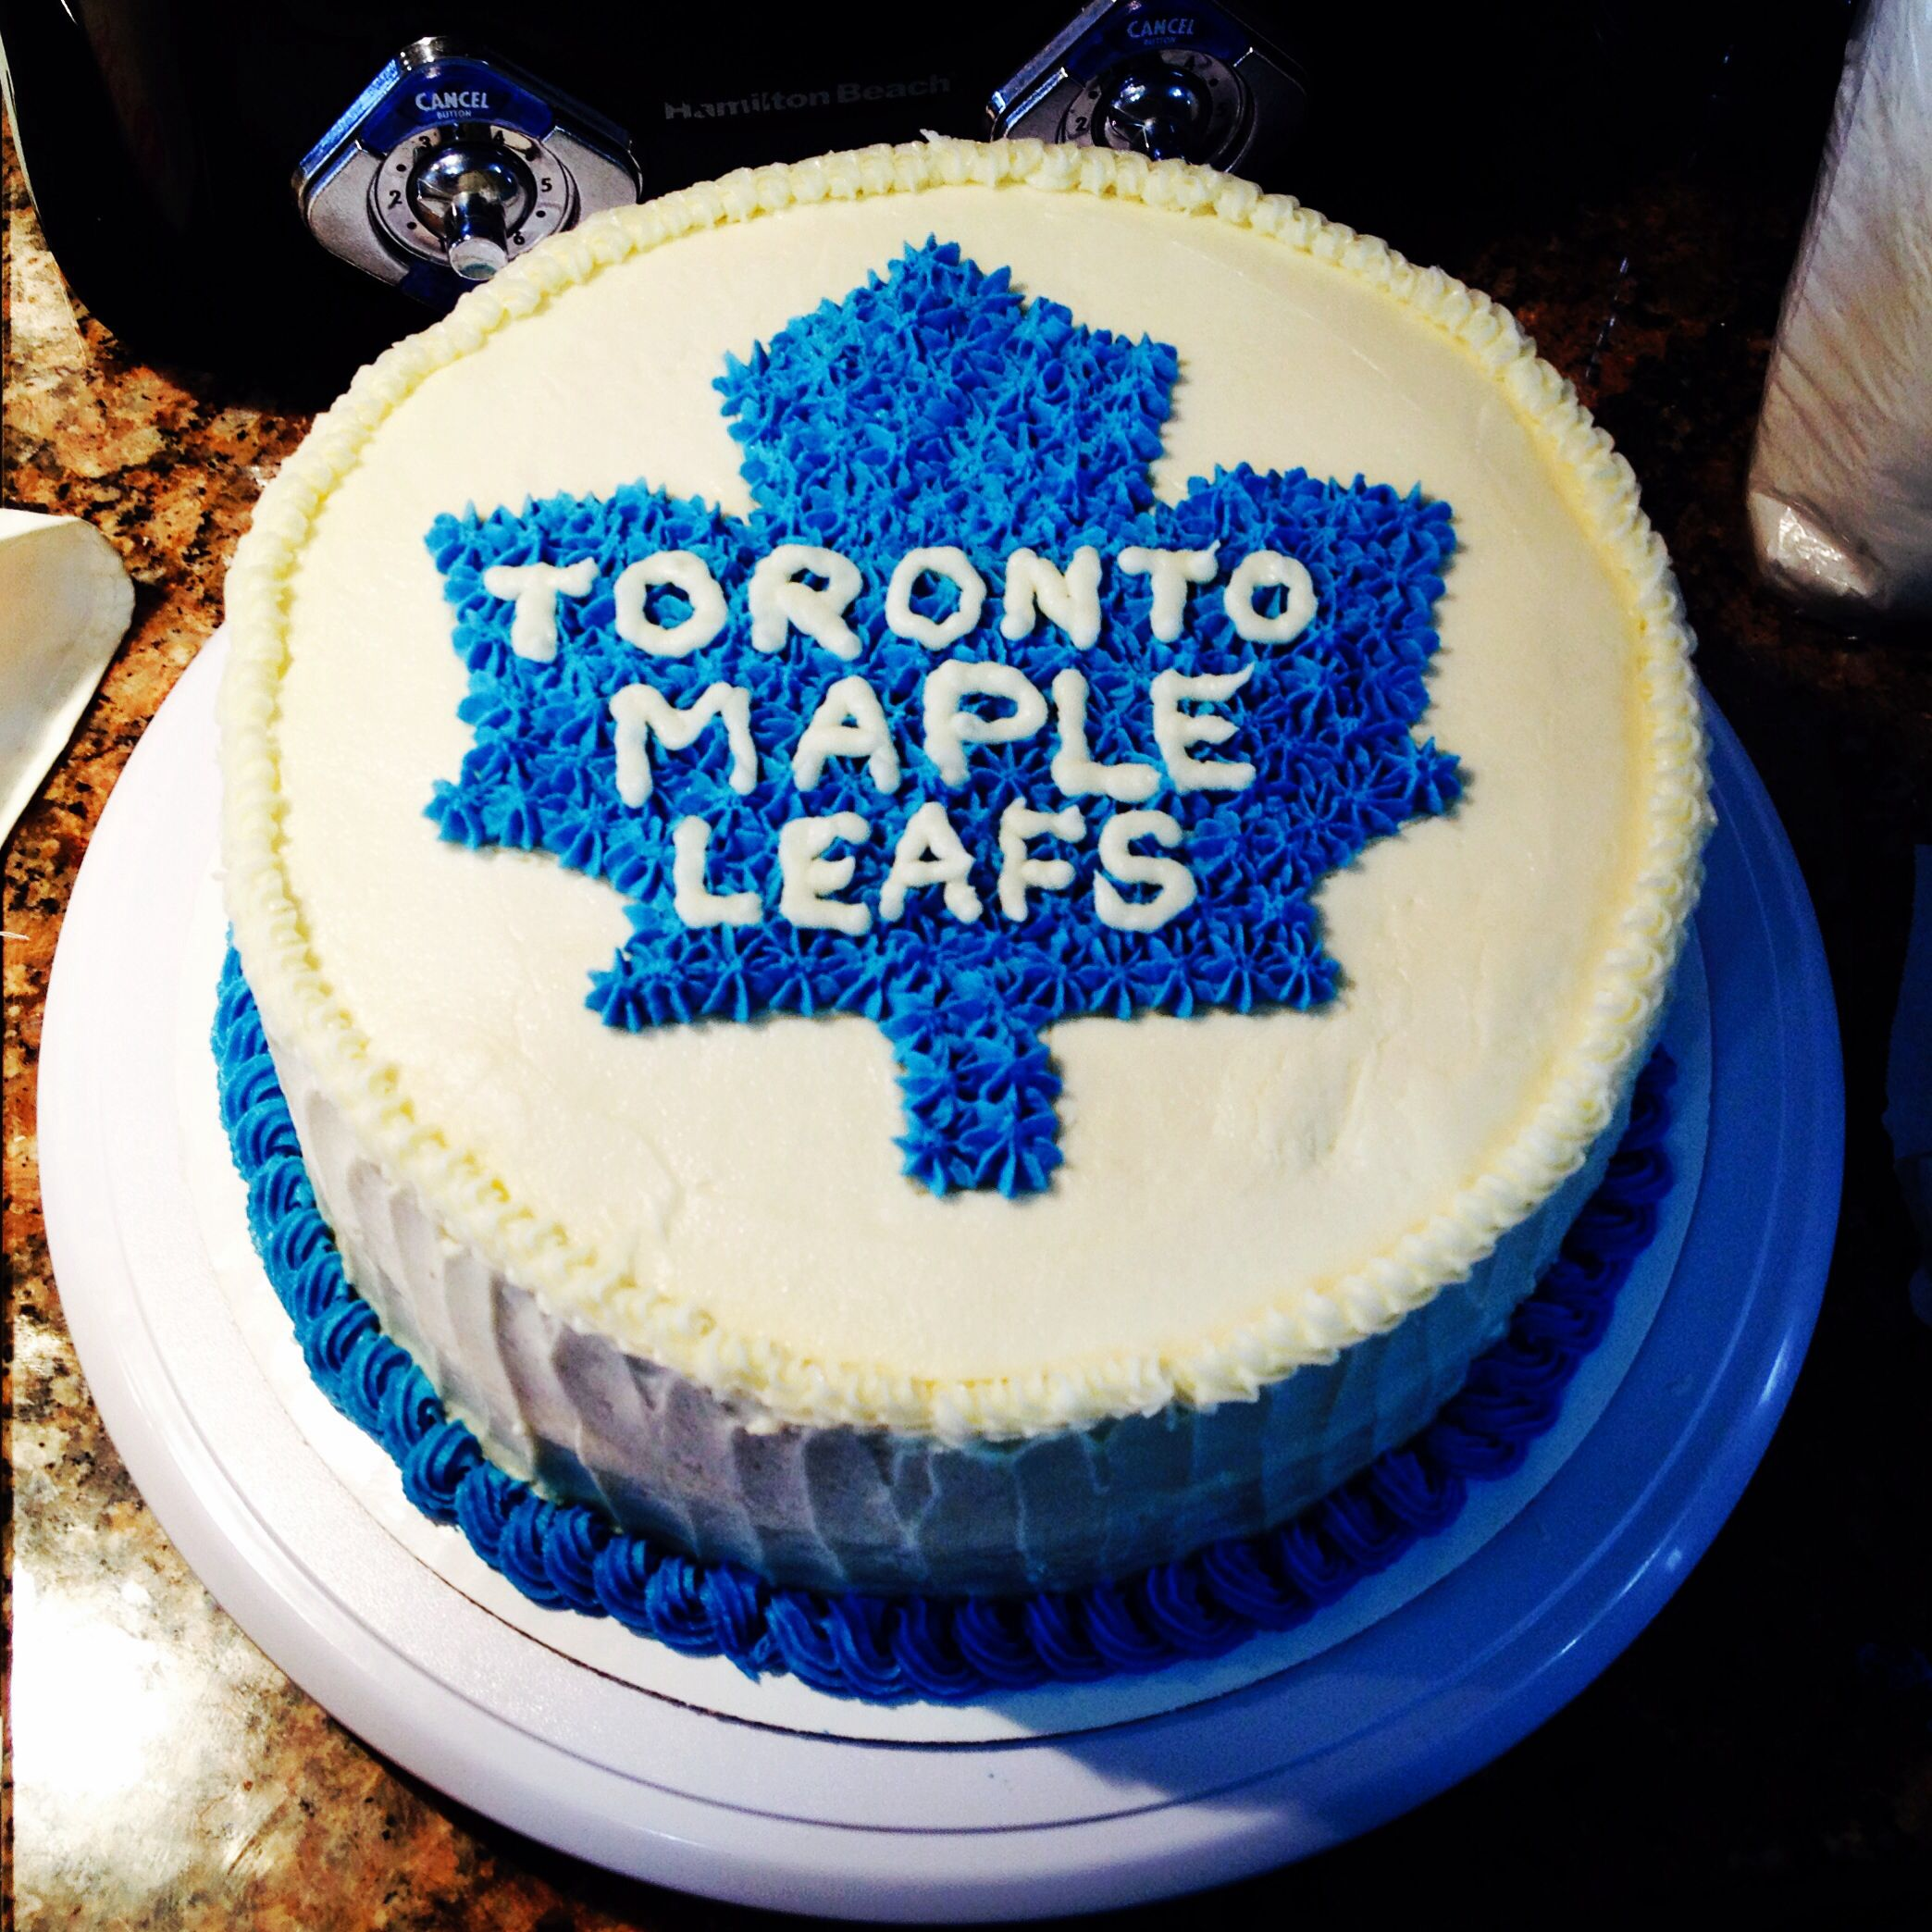 Happy Birthday Toronto Maple Leaf Cake